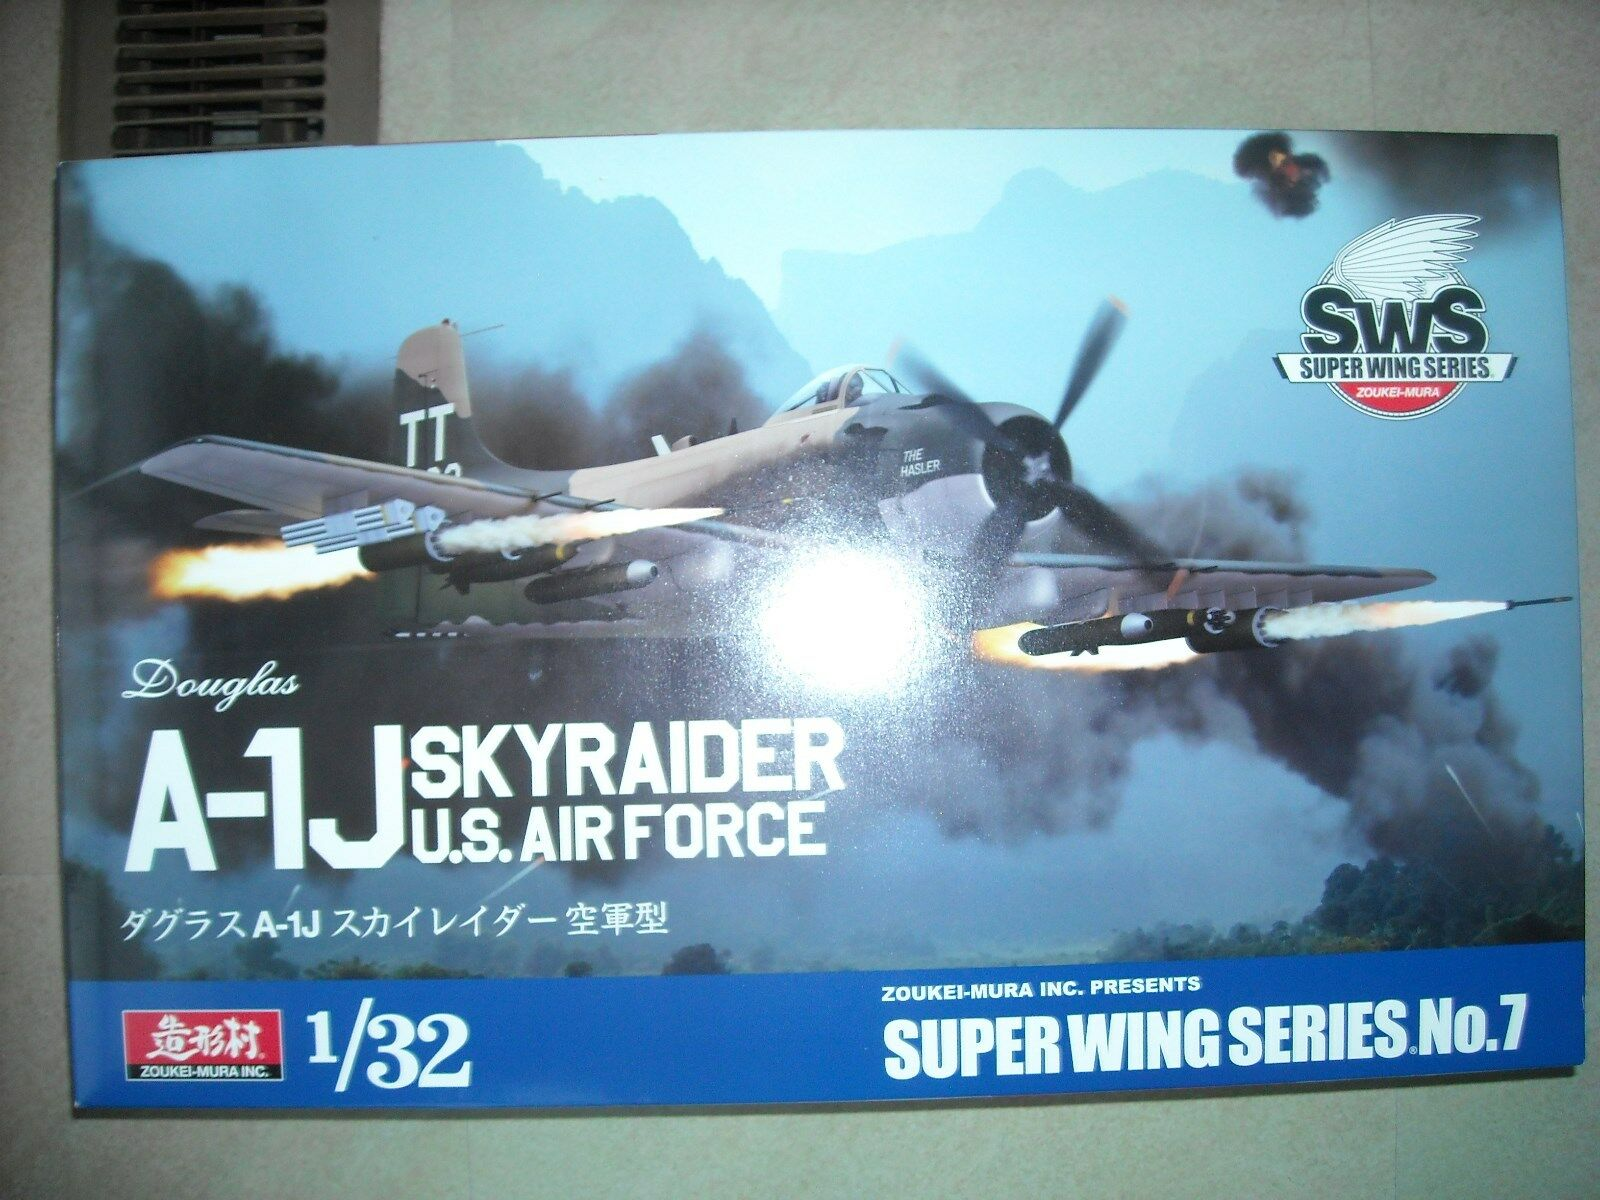 ZOUKEI-MURA-1 32-  7-SWSNO.3 A-J SKYRAIDER U.S. AIR FORCE